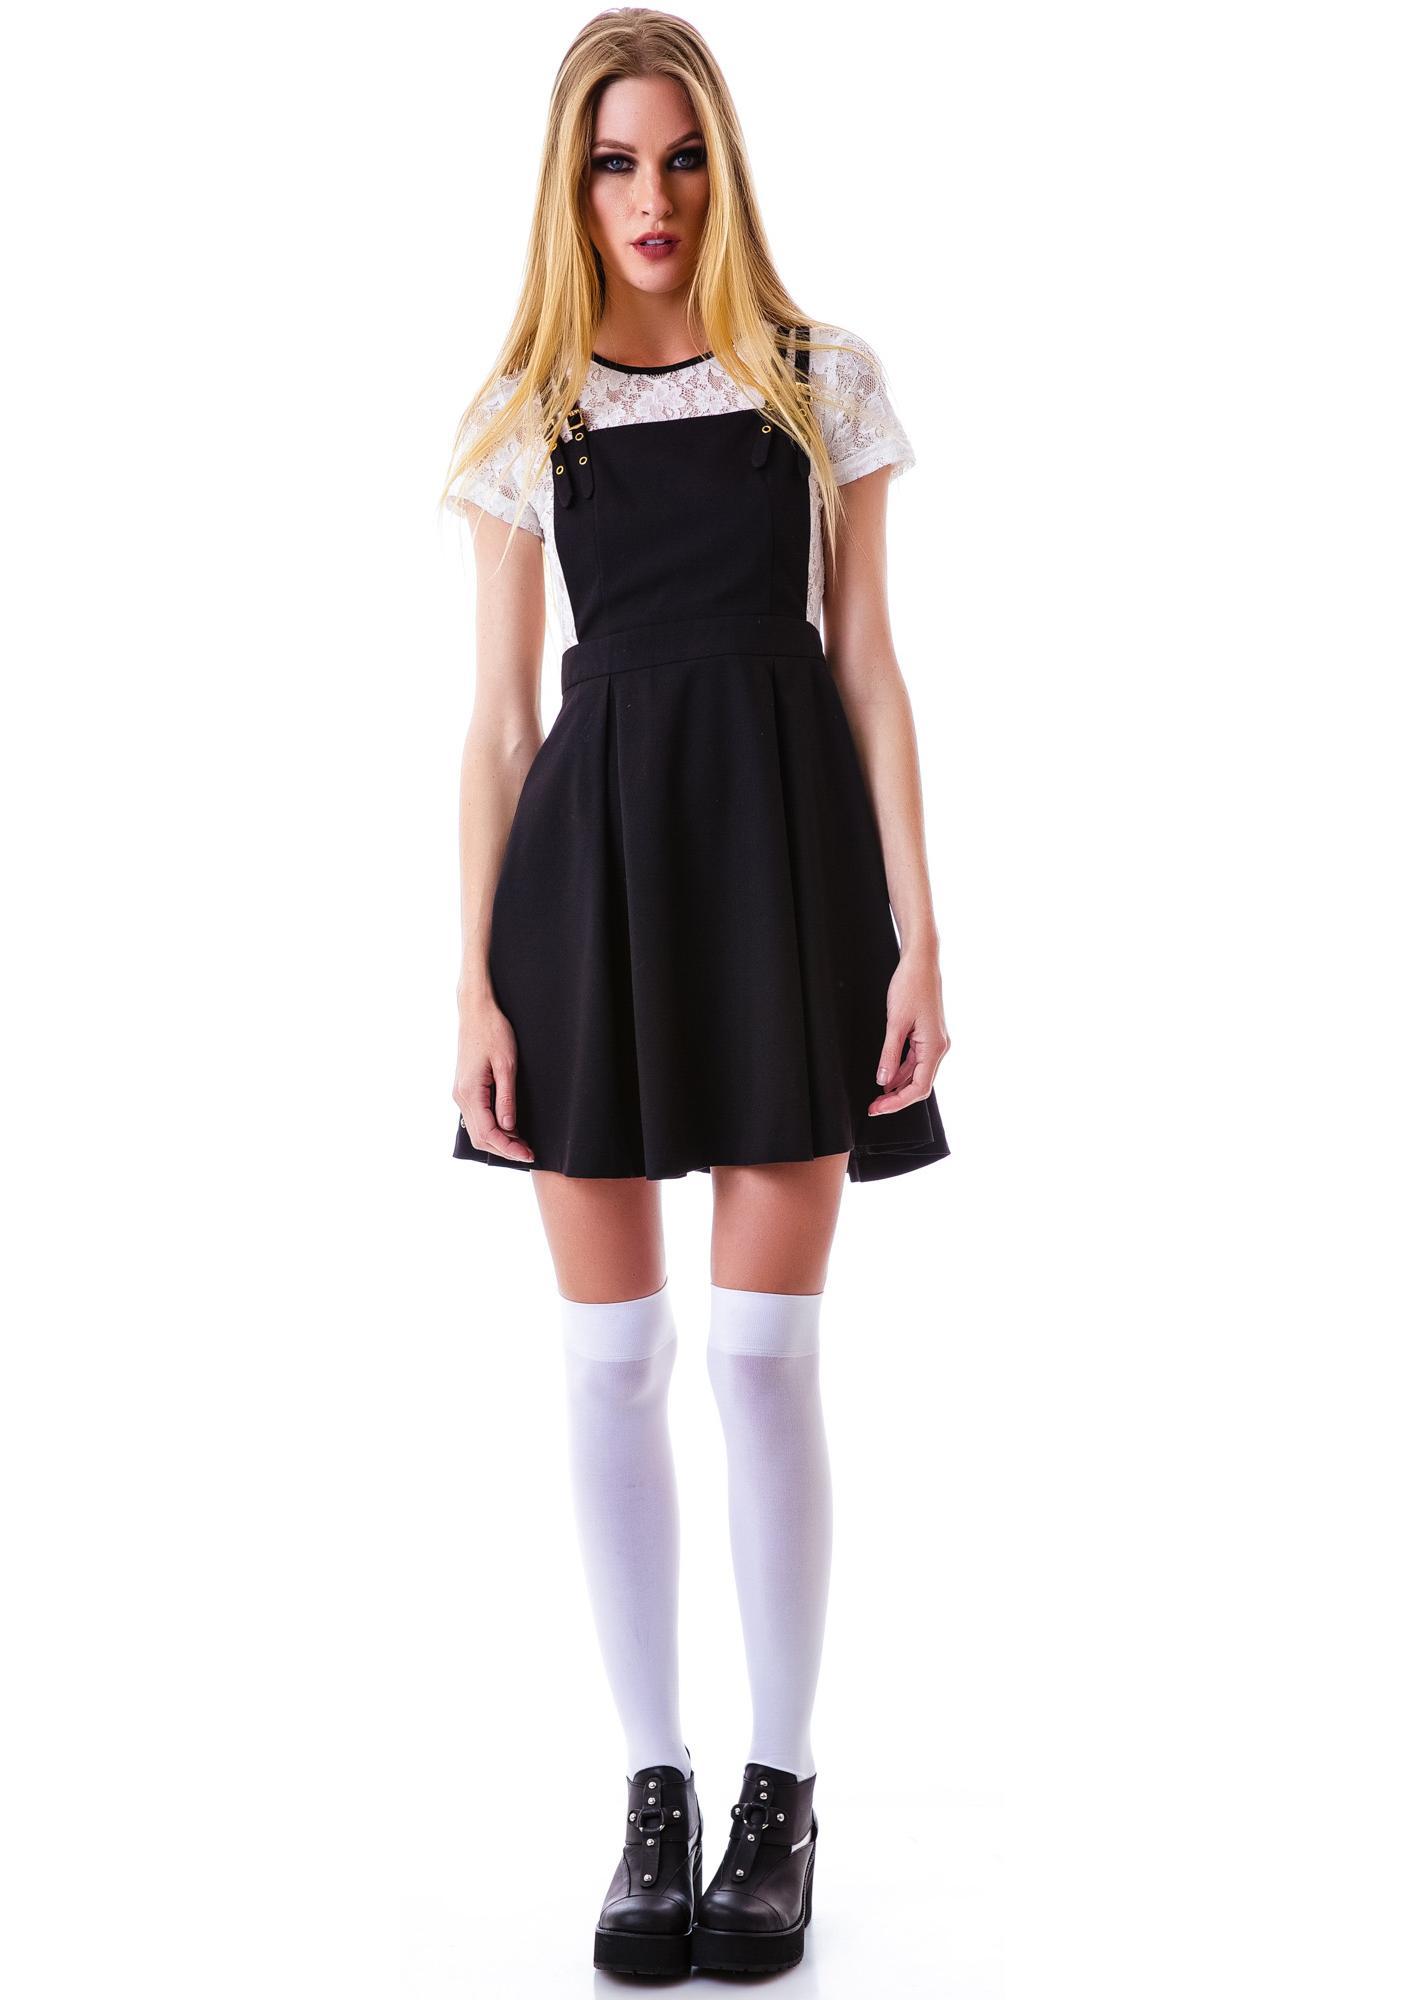 Zoe Lace Suspender Dress